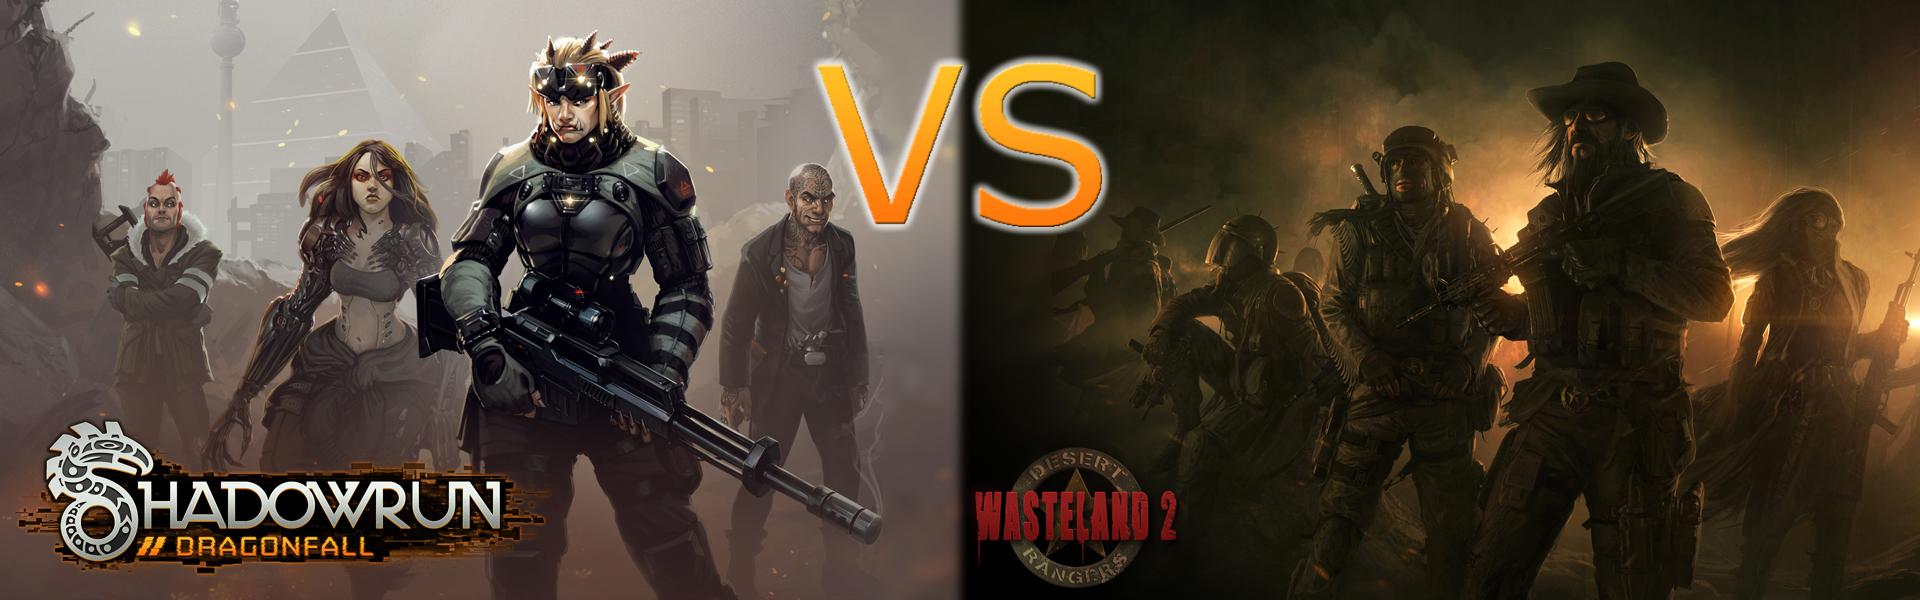 Shadowrun VS Wasteland